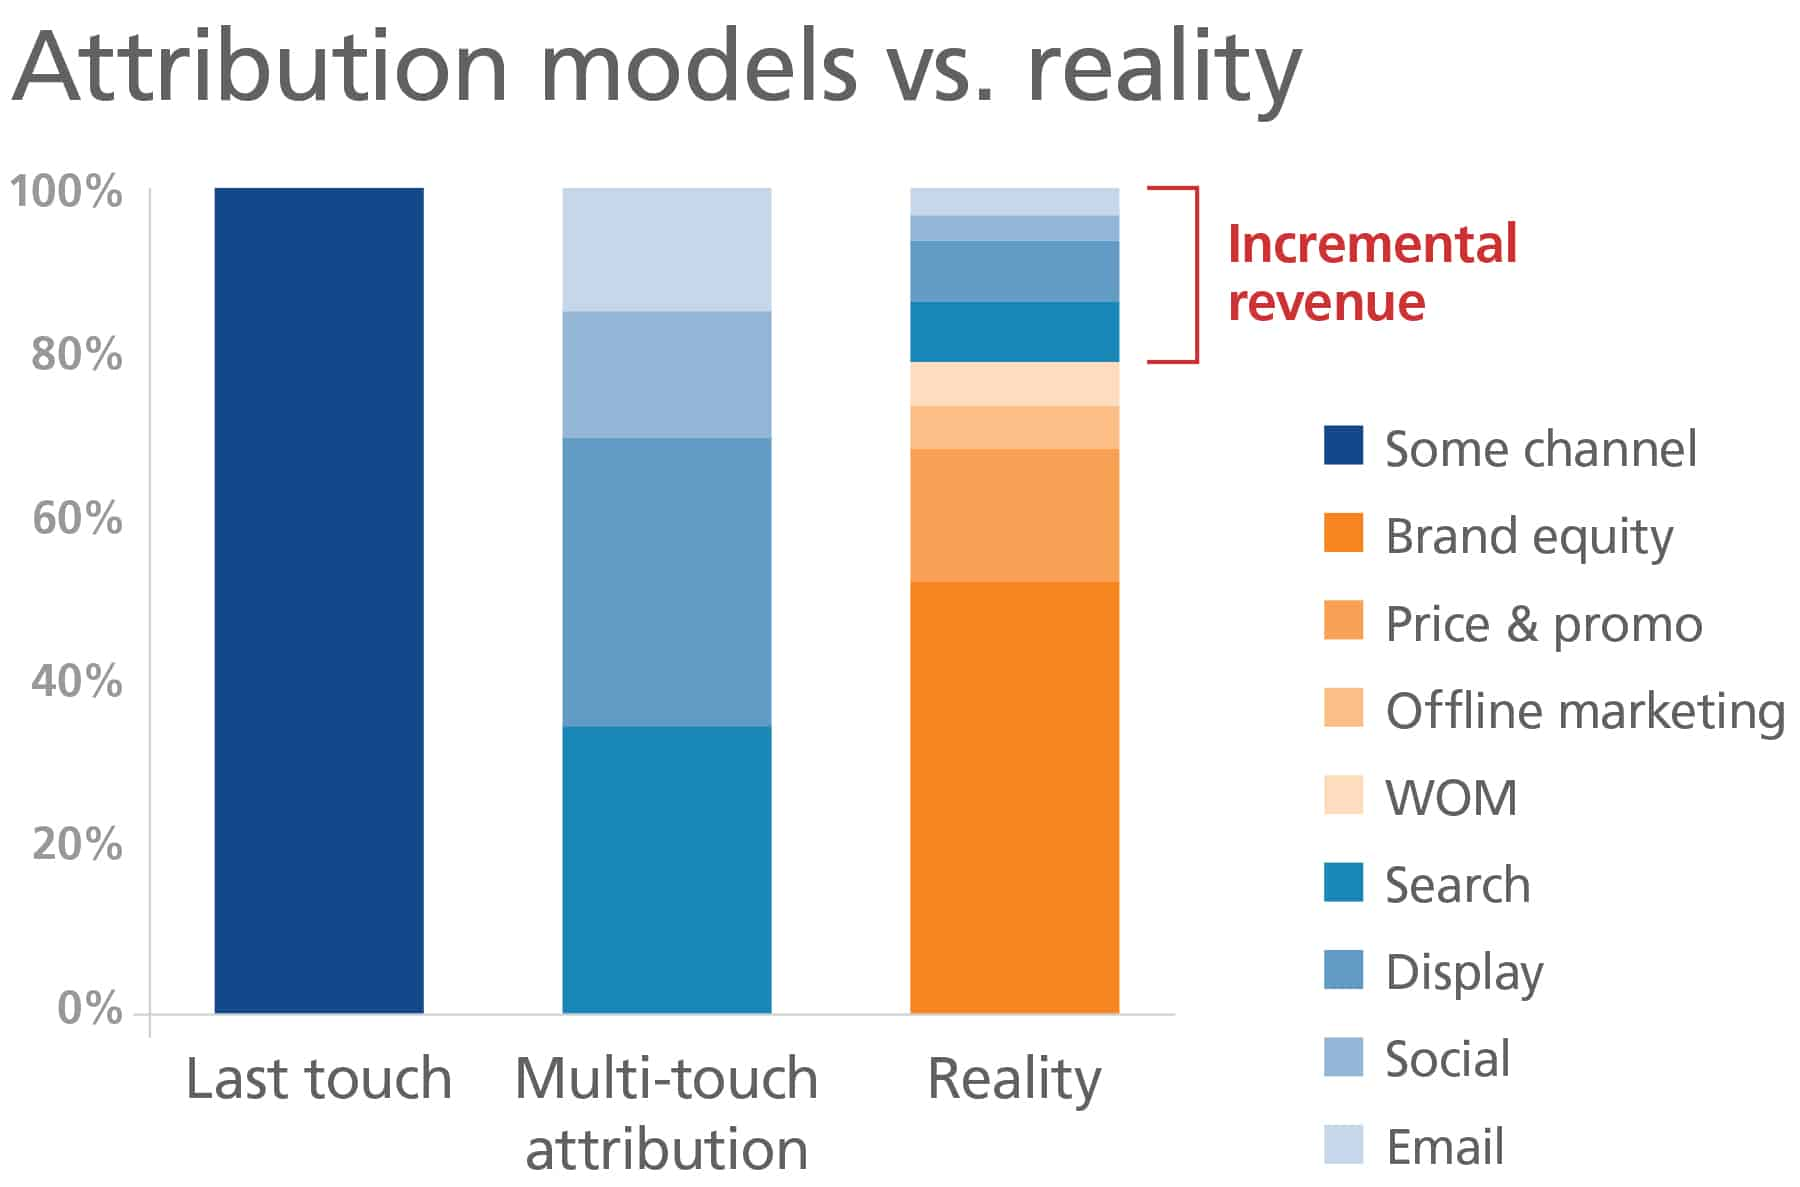 Determining revenue: Attribution models versus reality